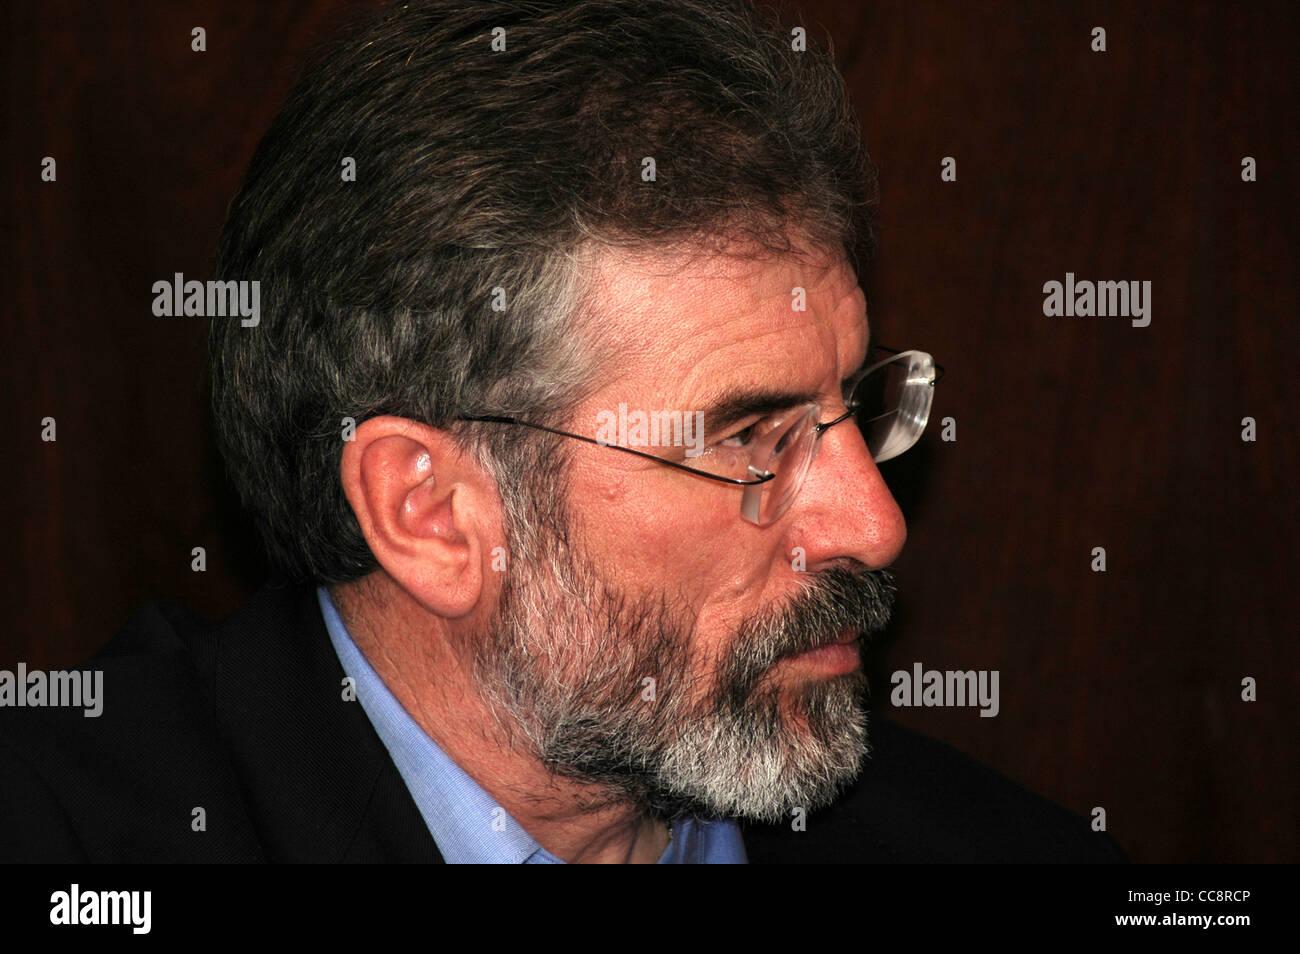 Gerry Adams, Sinn Fein President and member of the Irish Parliament. - Stock Image